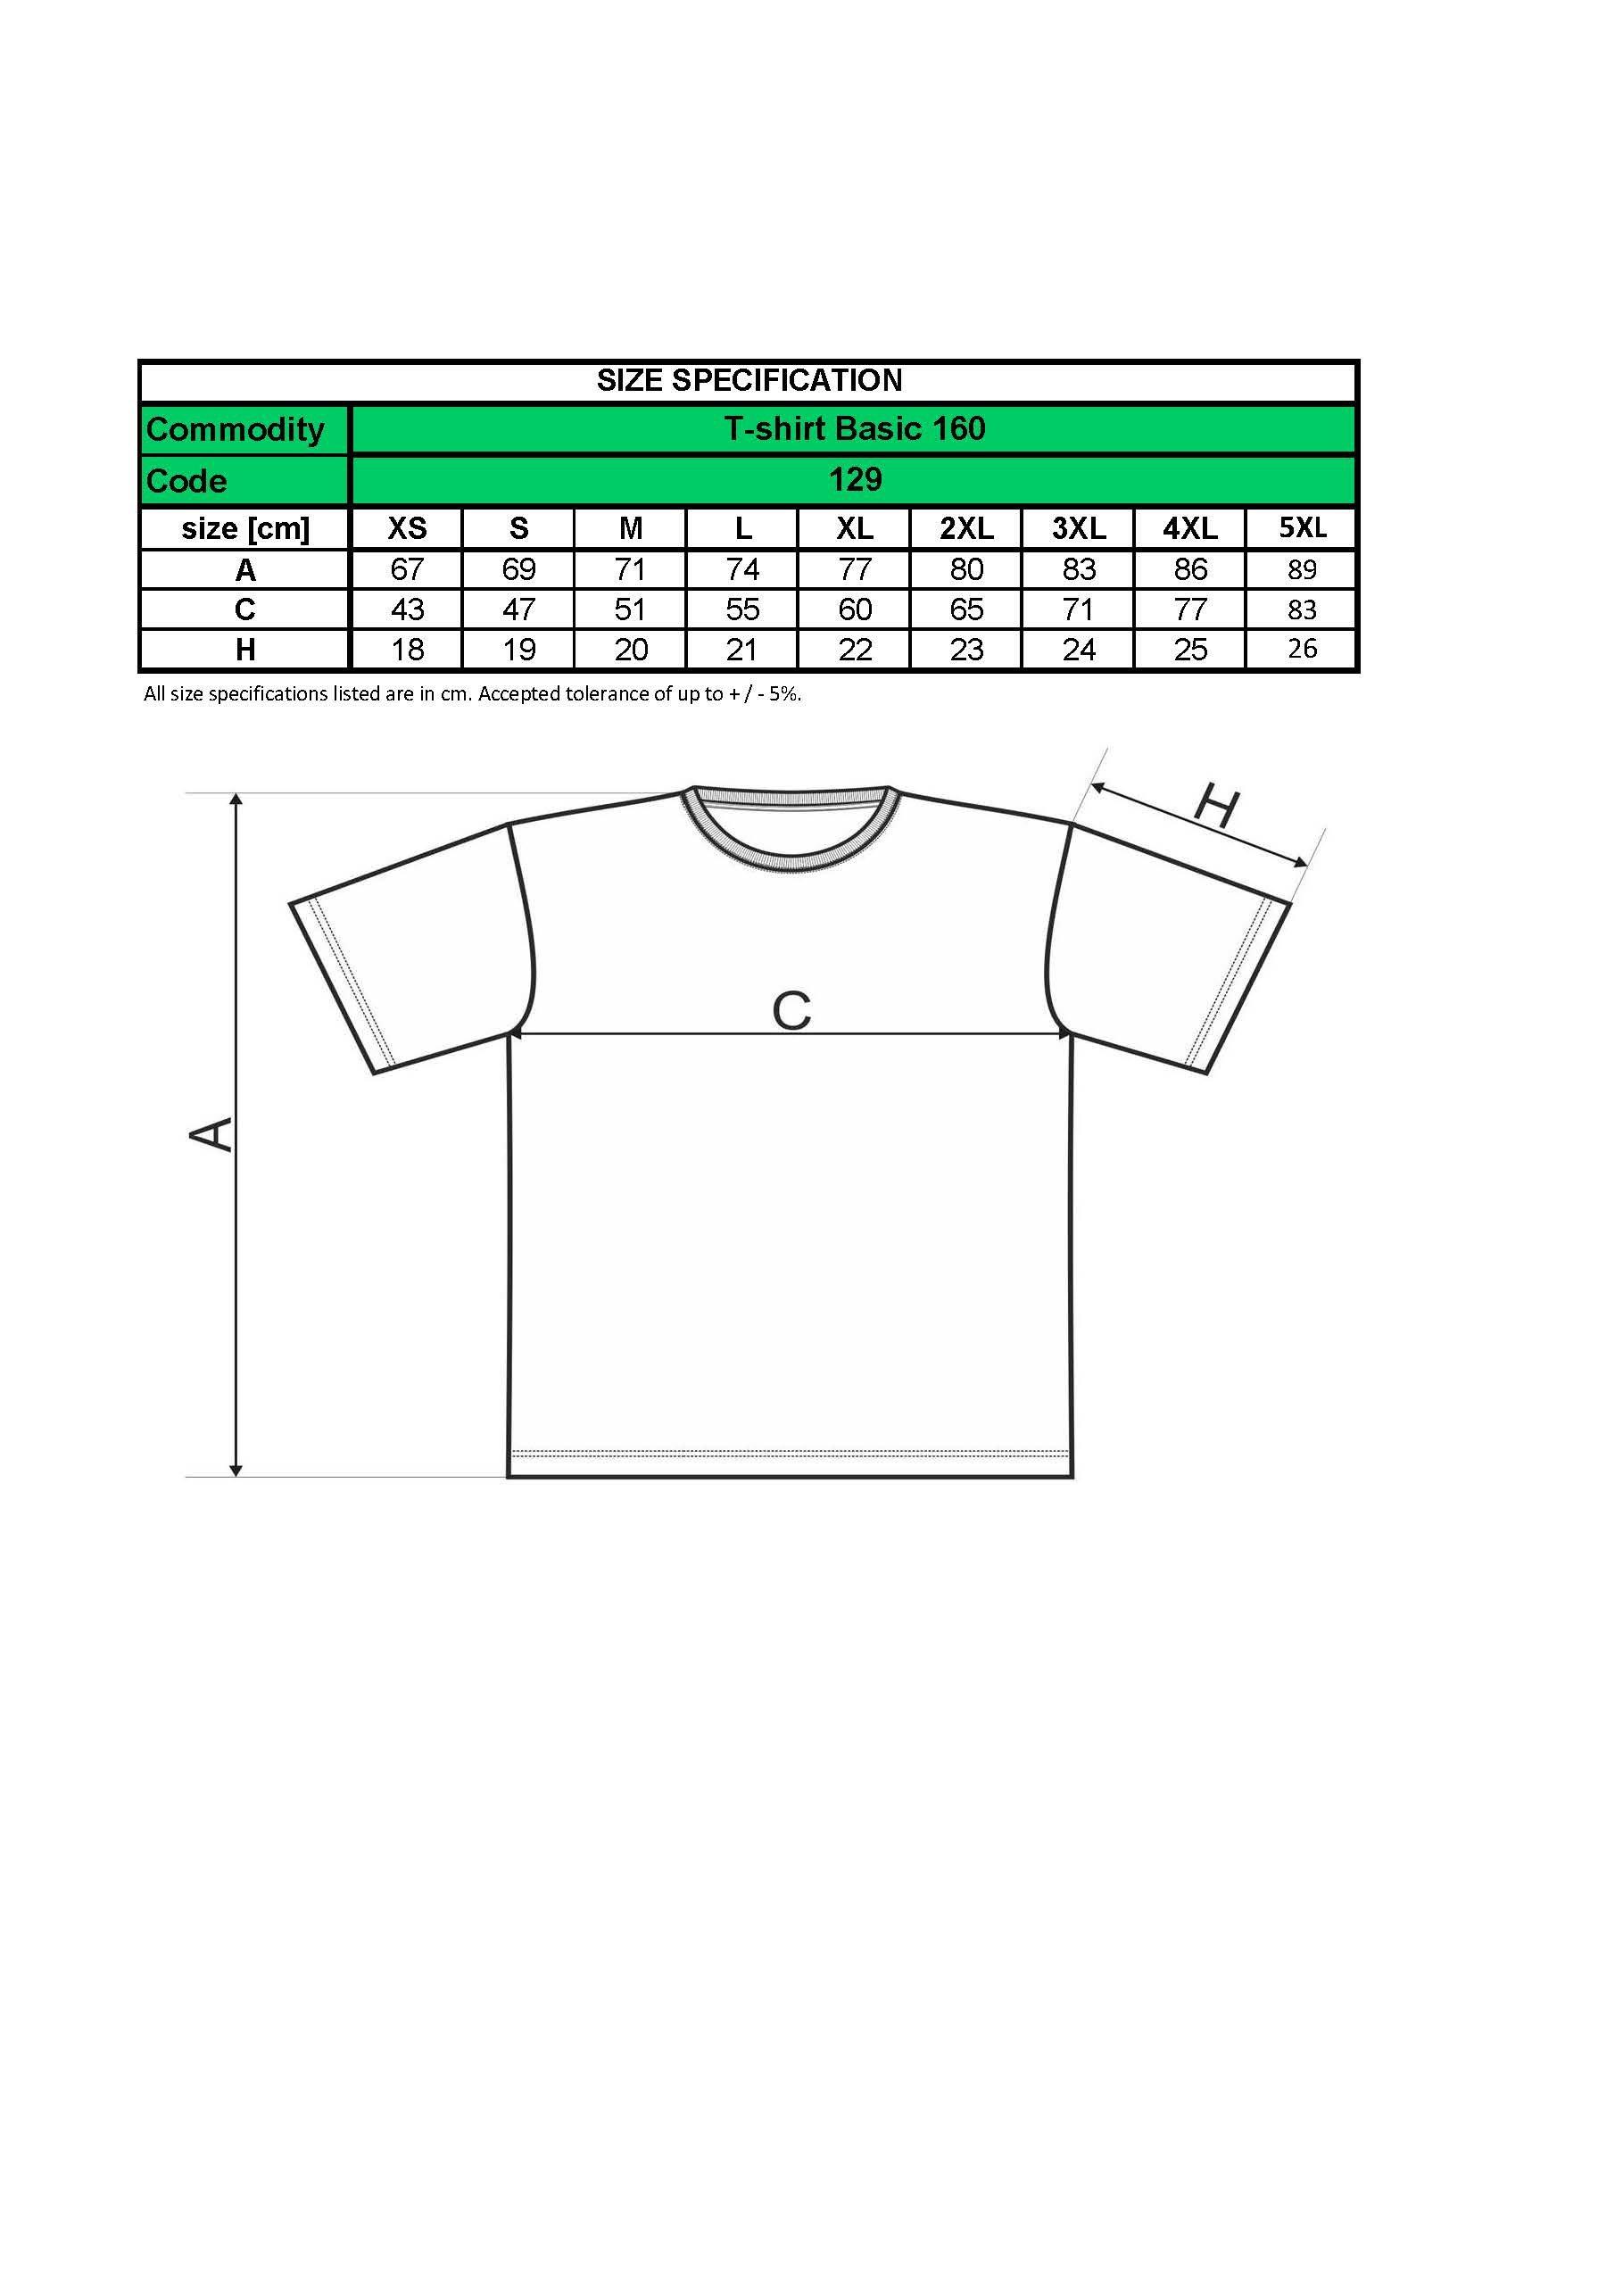 Custom Printed UK Promotional white Men T Shirt 129 size chart www.ontimeprint.co.uk